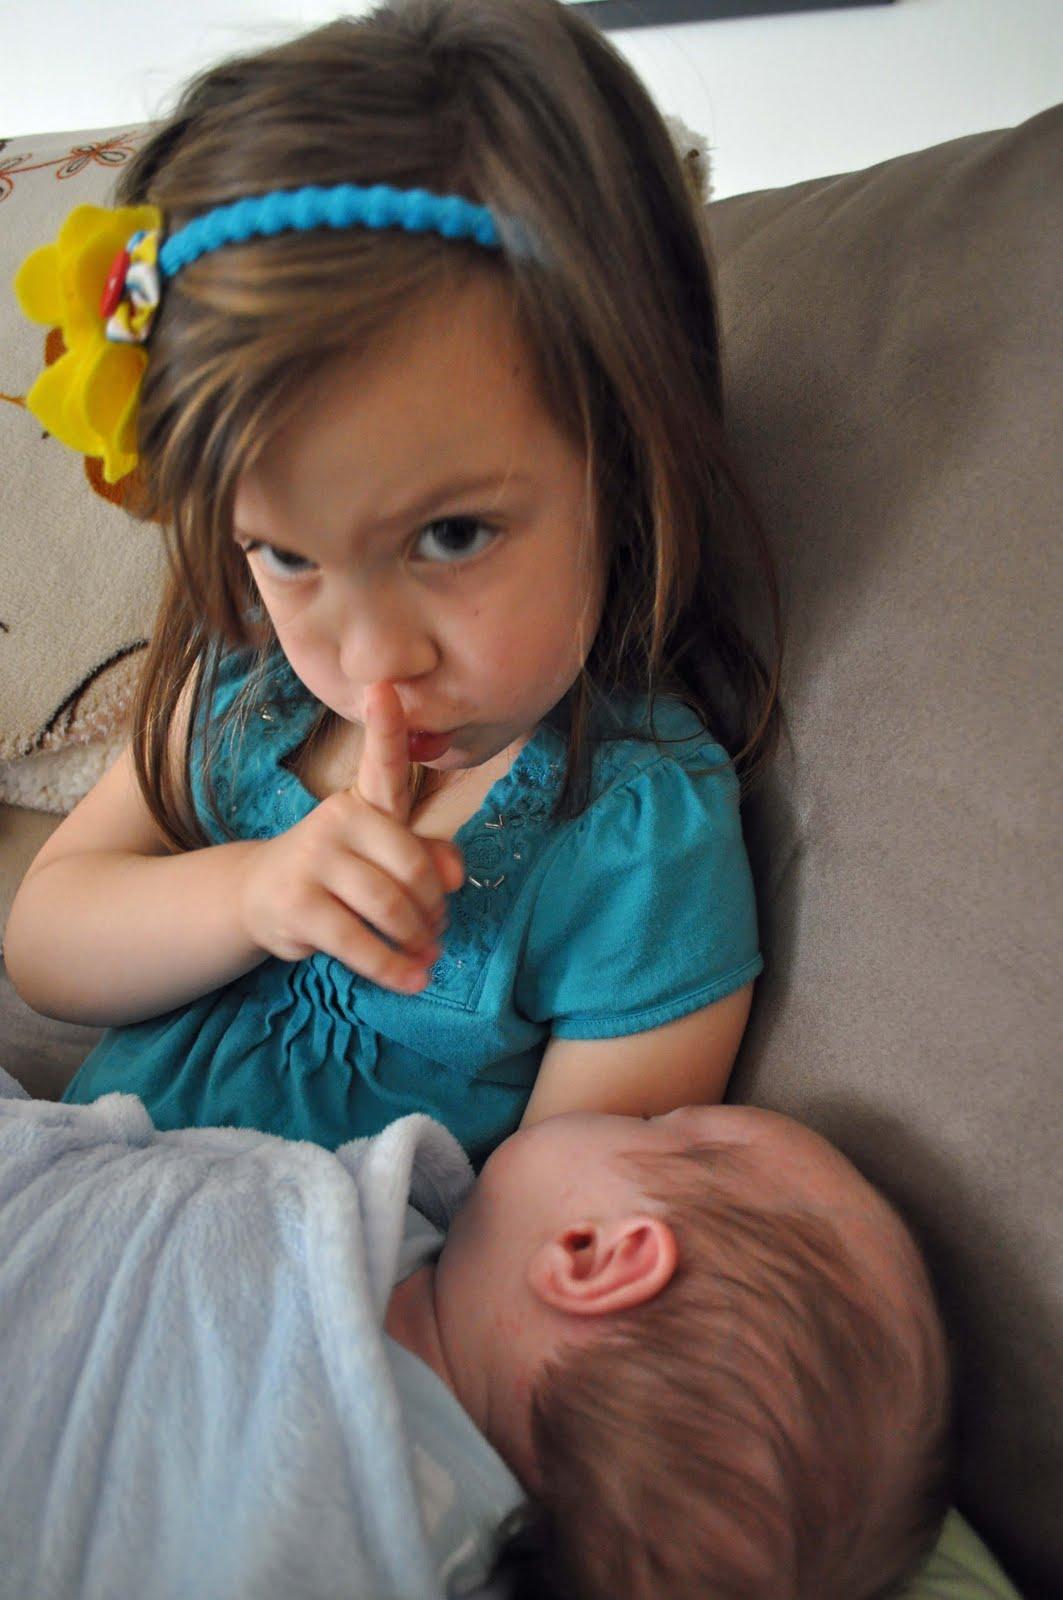 [Shh+My+Cousin+is+Sleeping.JPG]